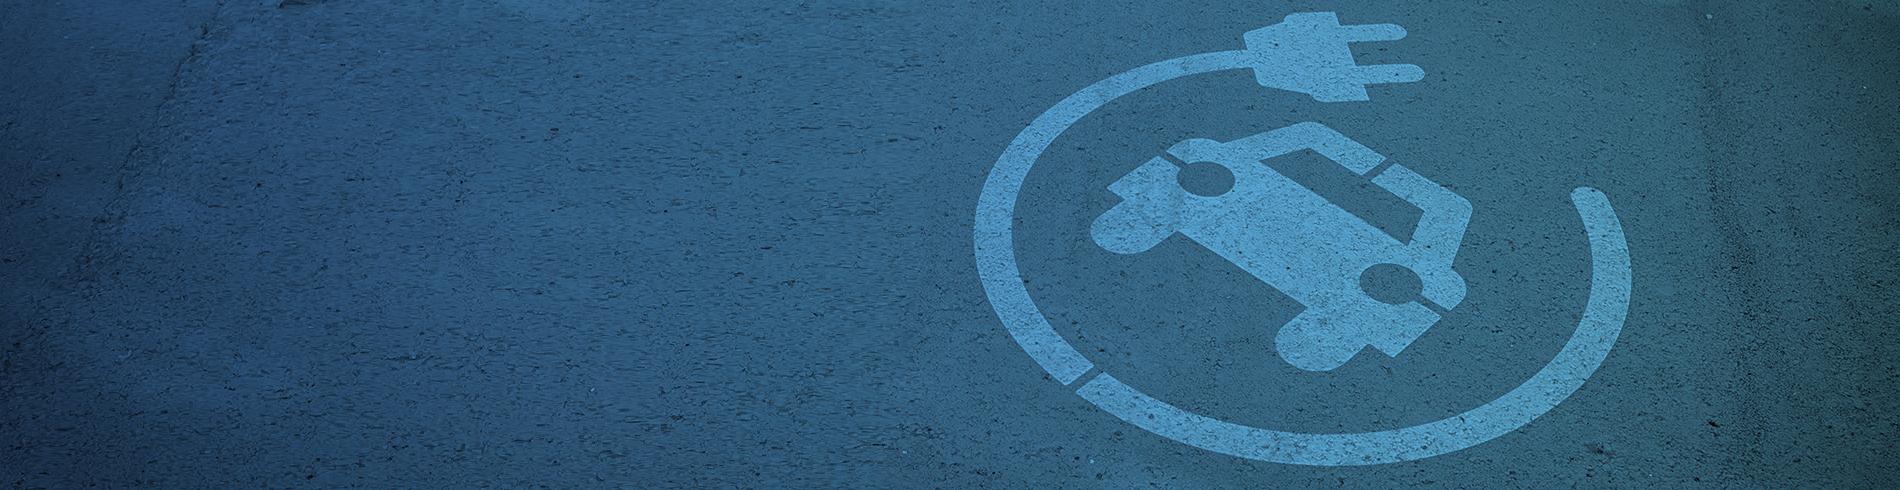 Assegurança de cotxe elèctric